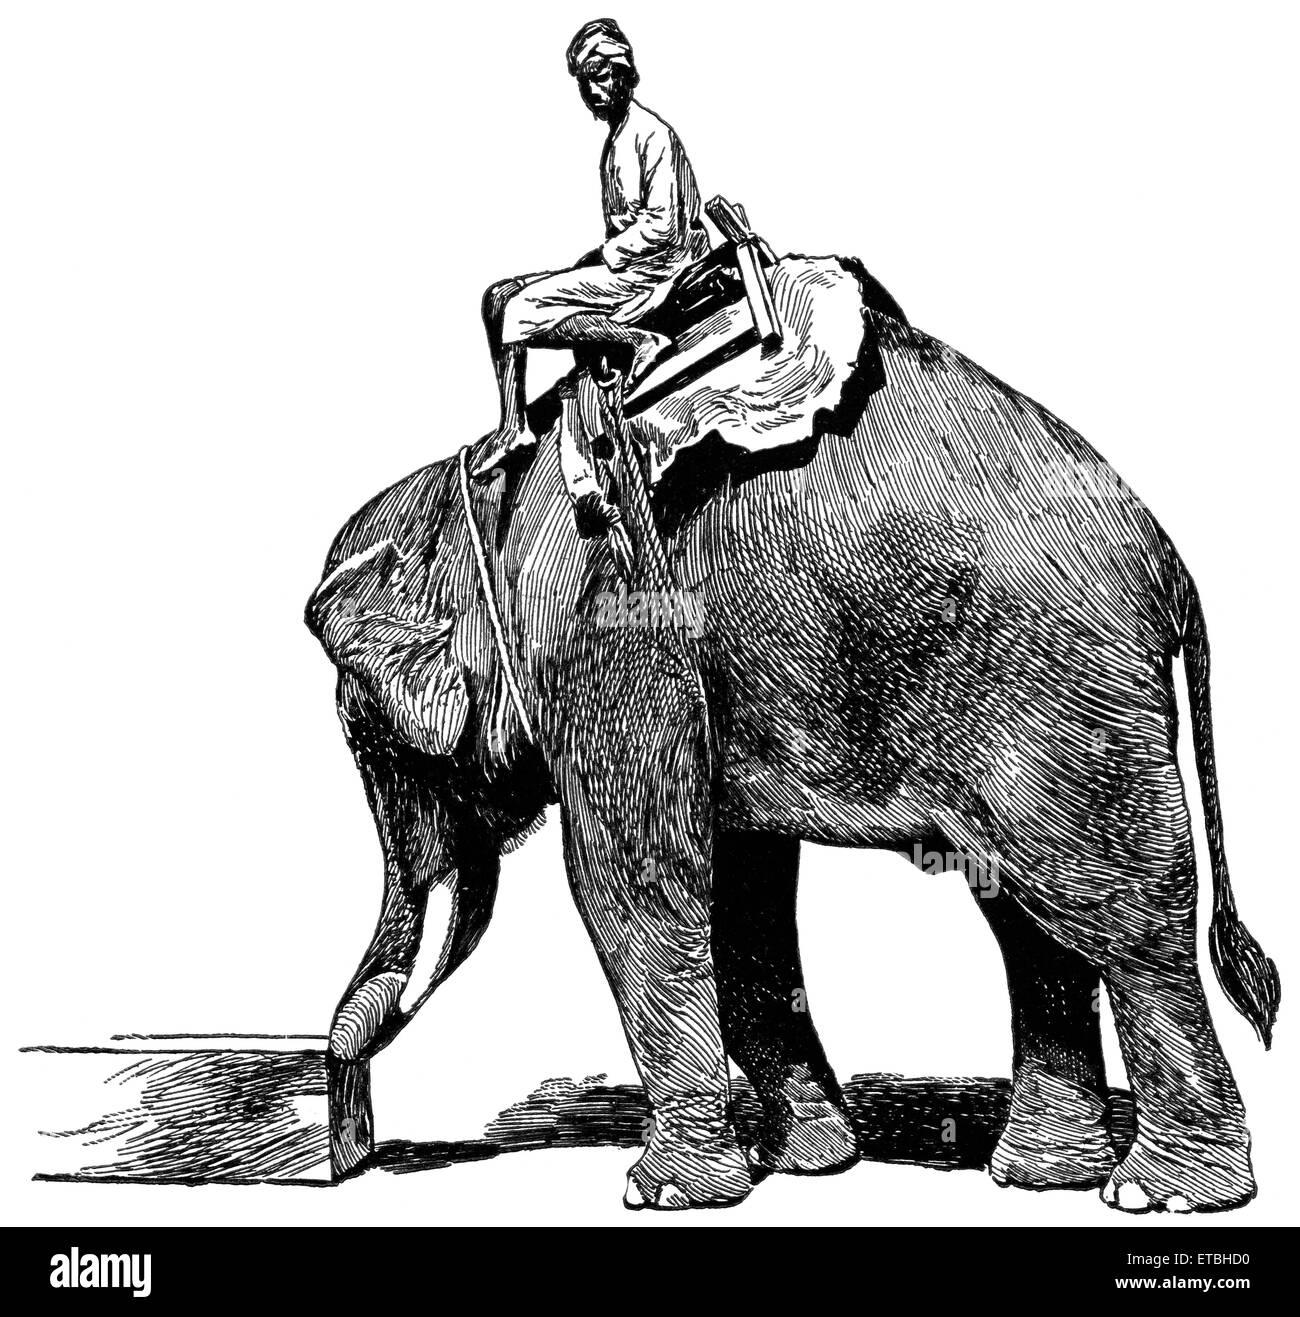 Elephant Pushing Timber, Rangoon, Burma, 'Classical Portfolio of Primitive Carriers', by Marshall M. Kirman, - Stock Image